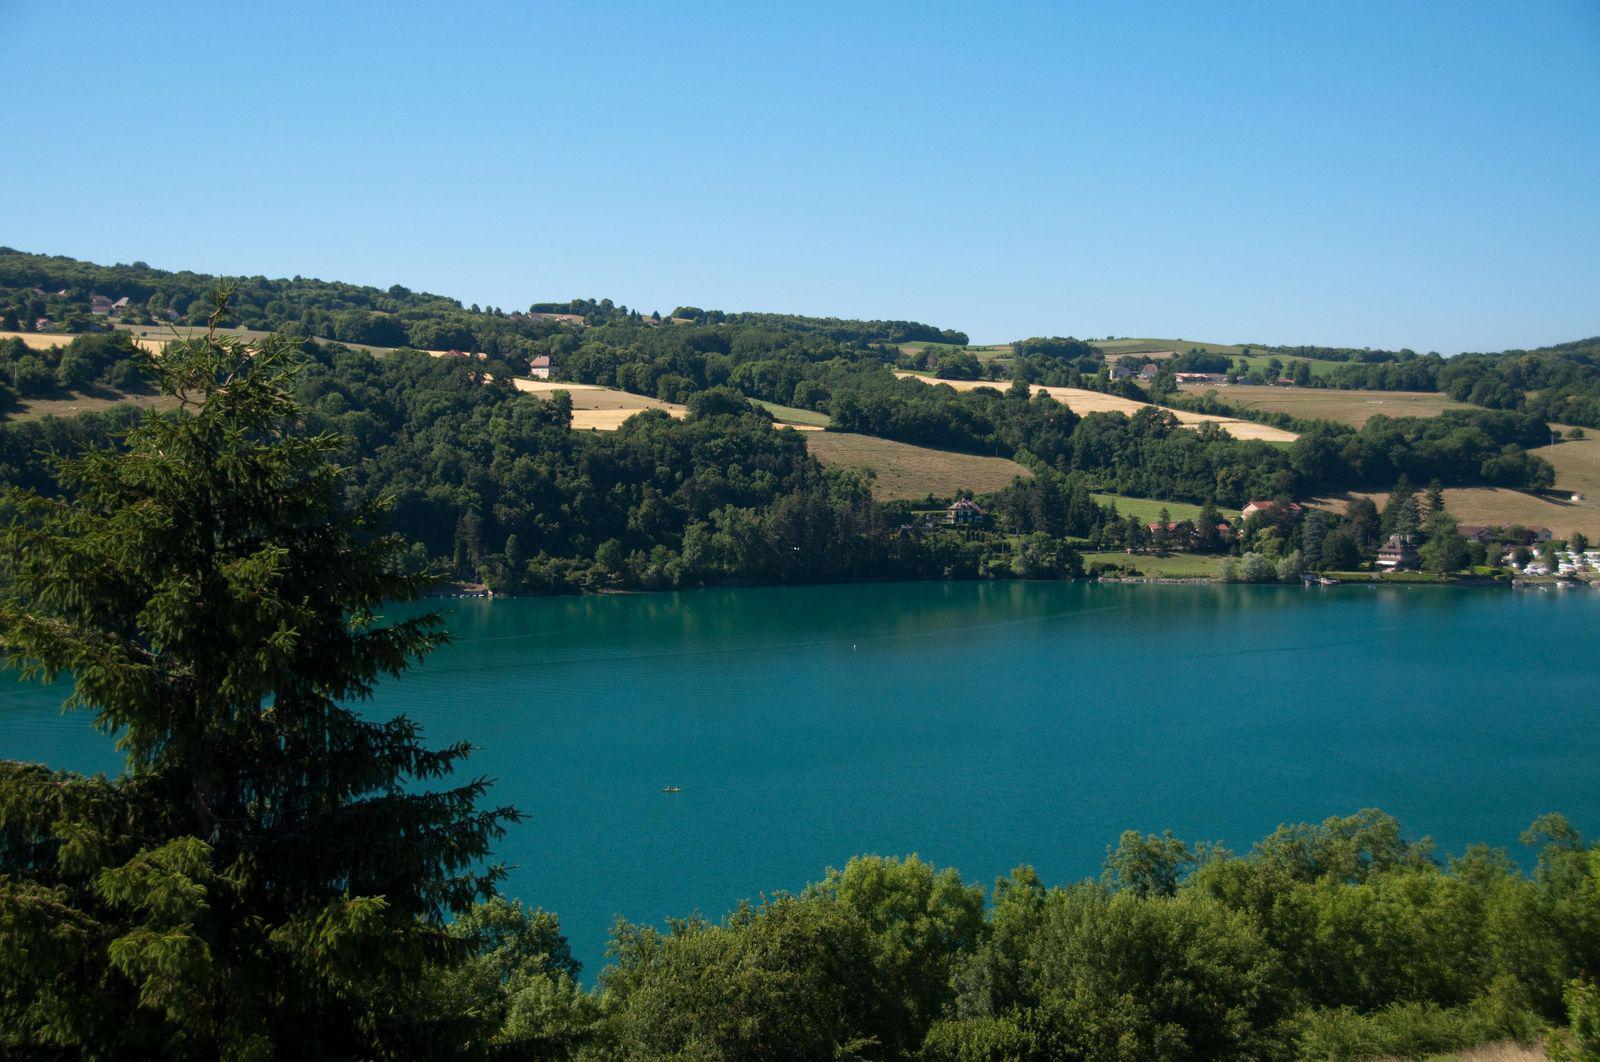 Lac de Paladru_Charavines